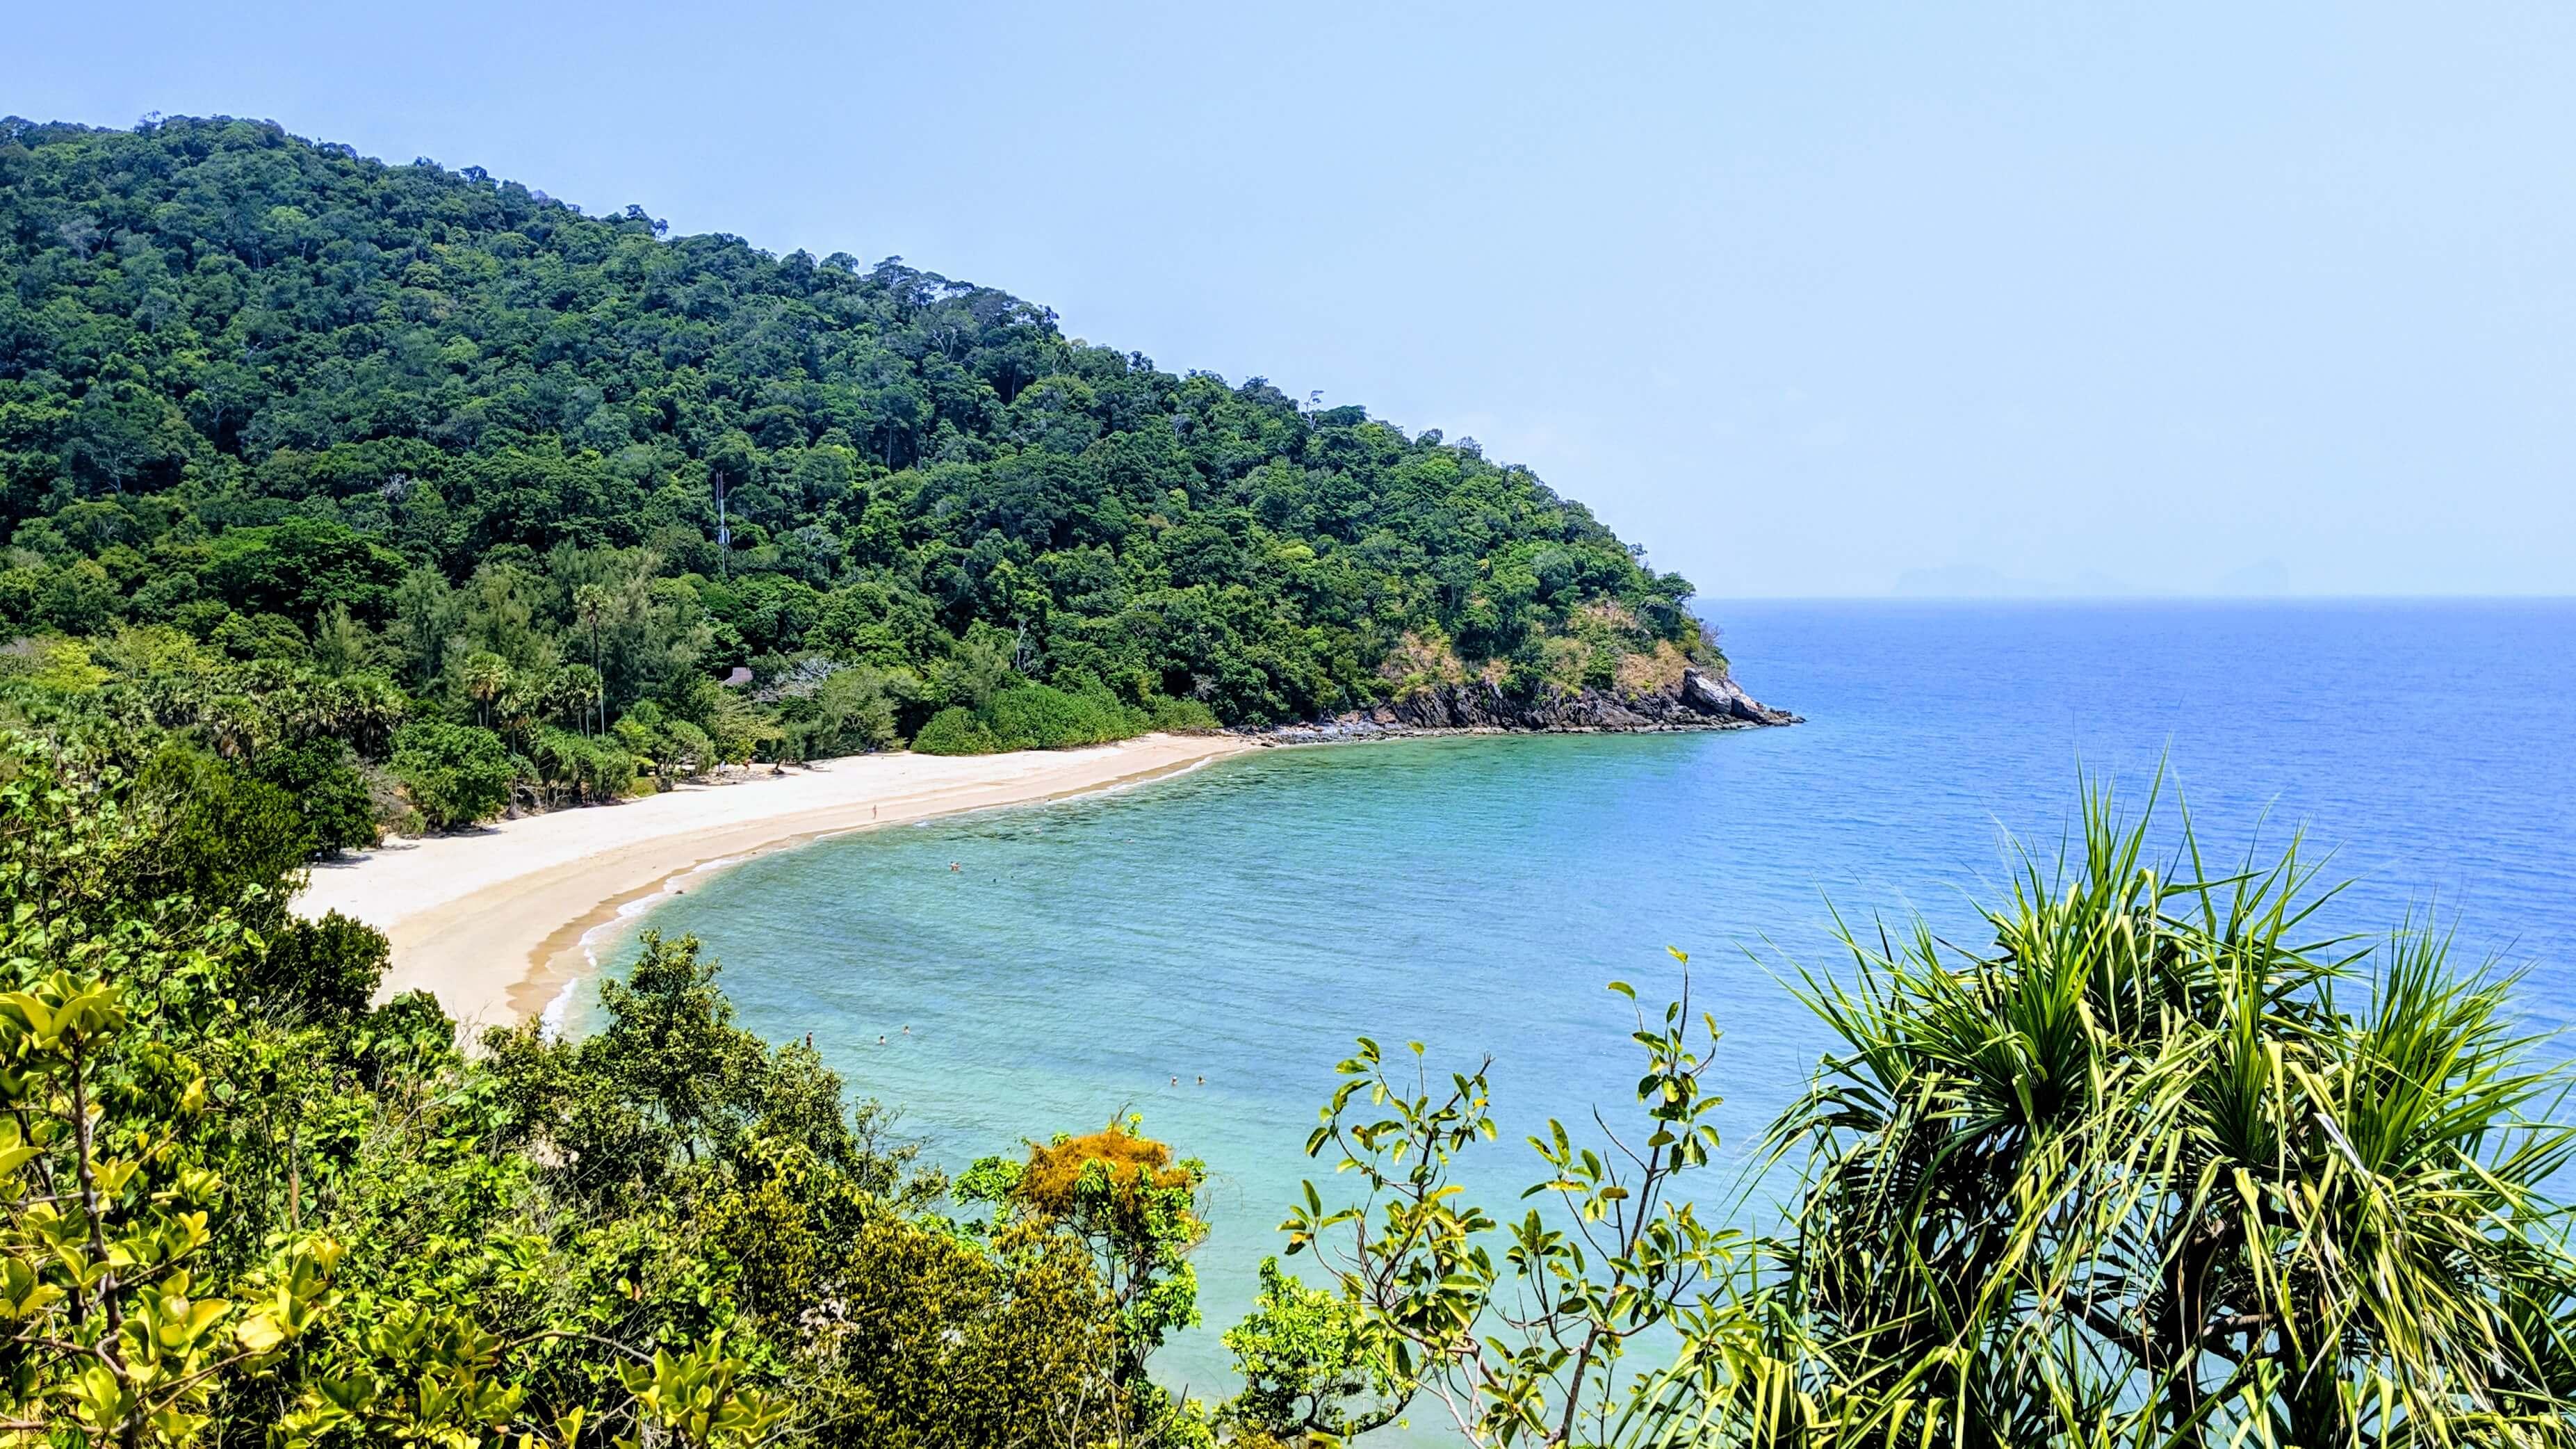 Mo Ku Lanta National Park view of the beach.